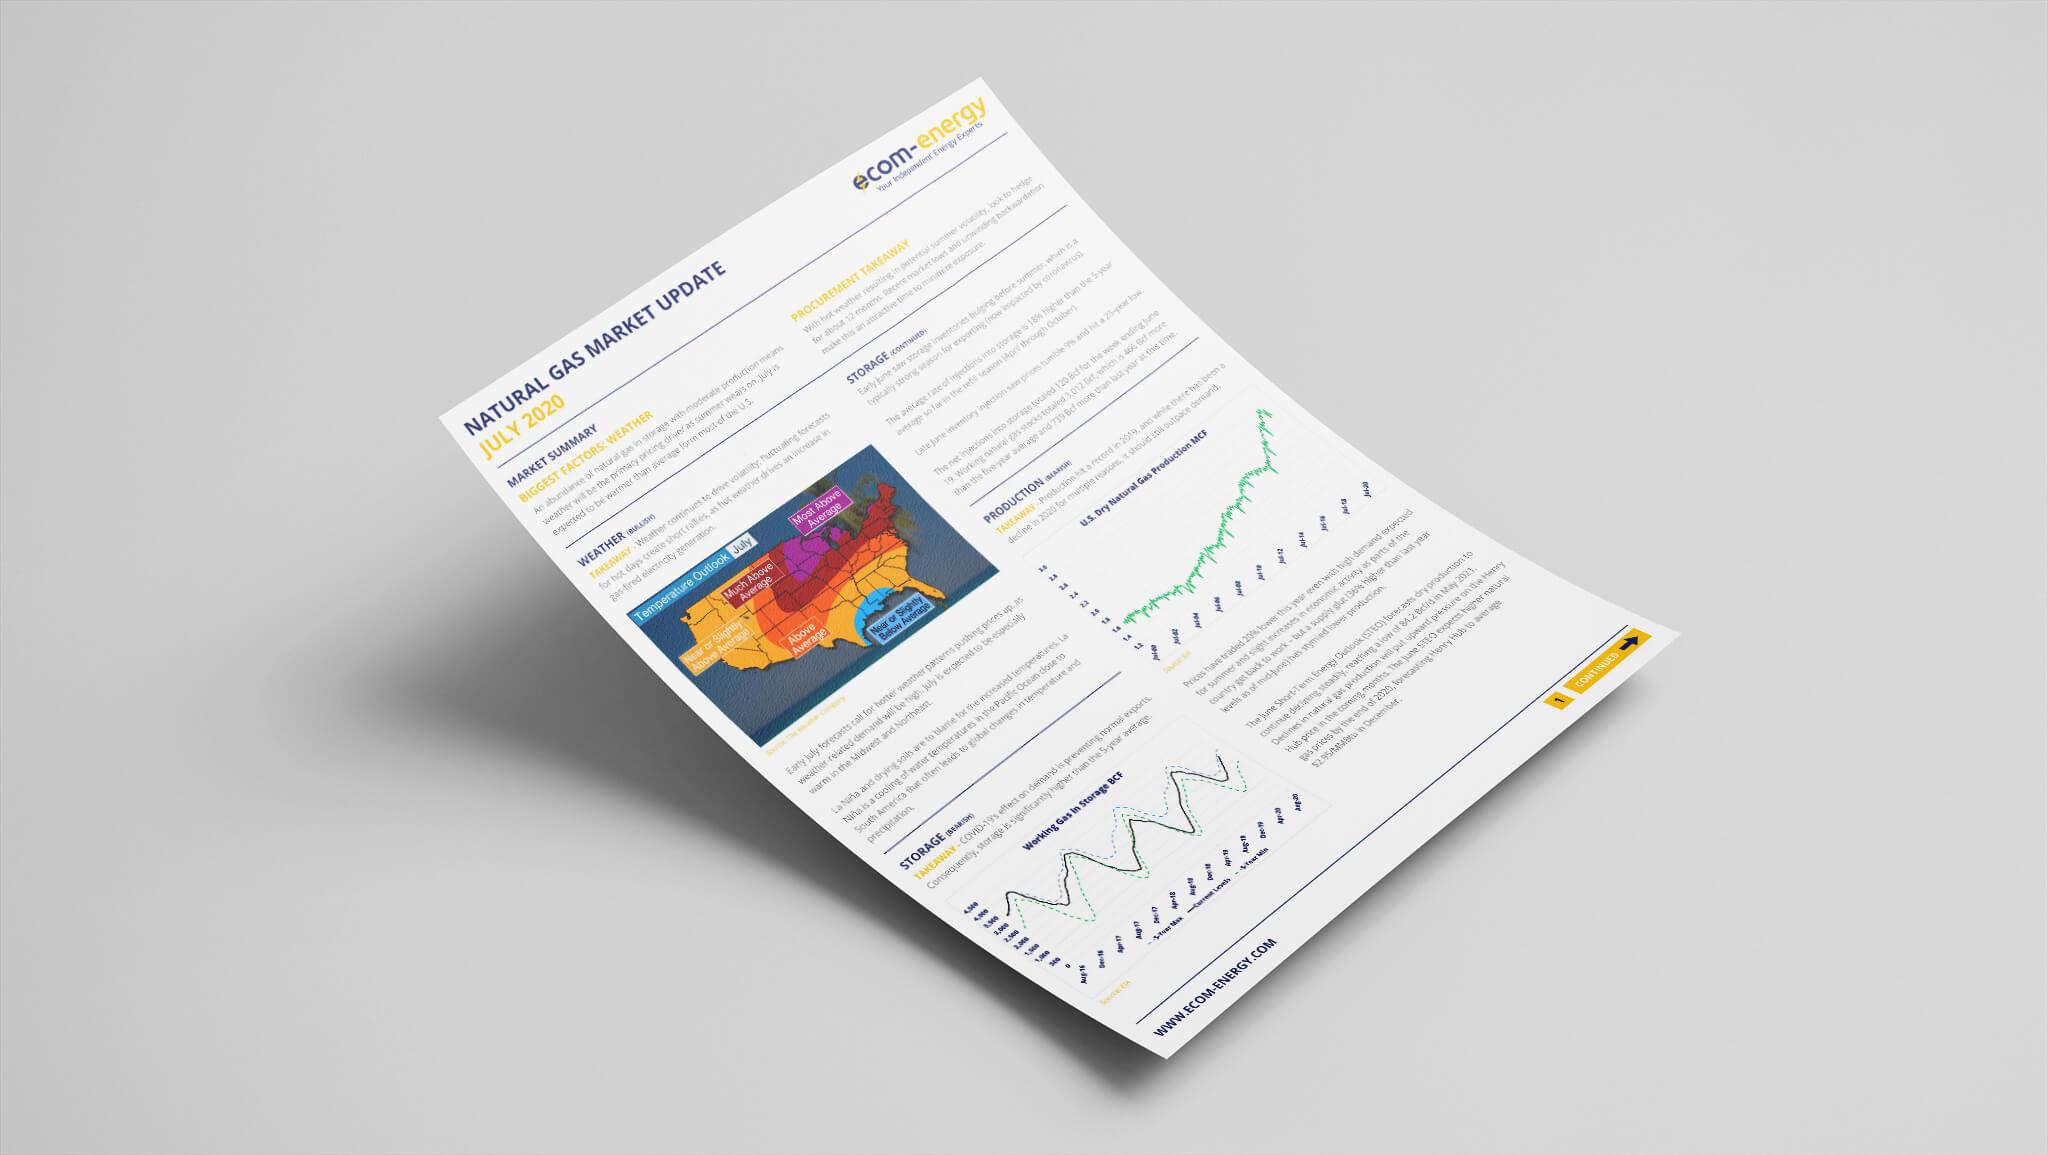 Ecom-Energy-July-20-Market-Update